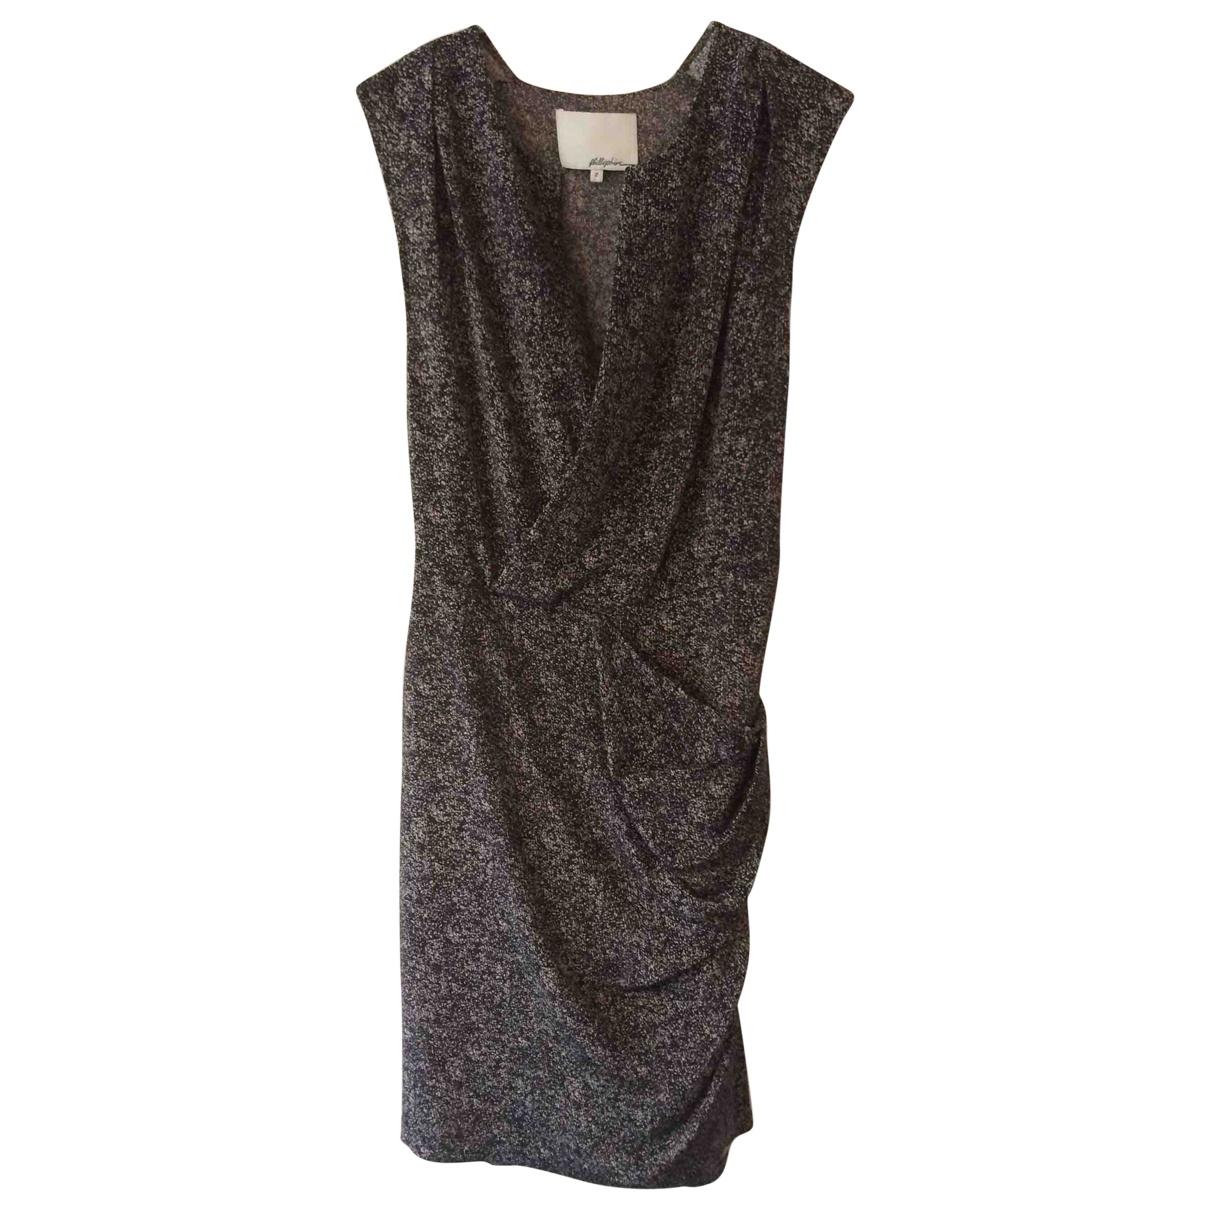 3.1 Phillip Lim \N Anthracite Silk dress for Women 34 FR